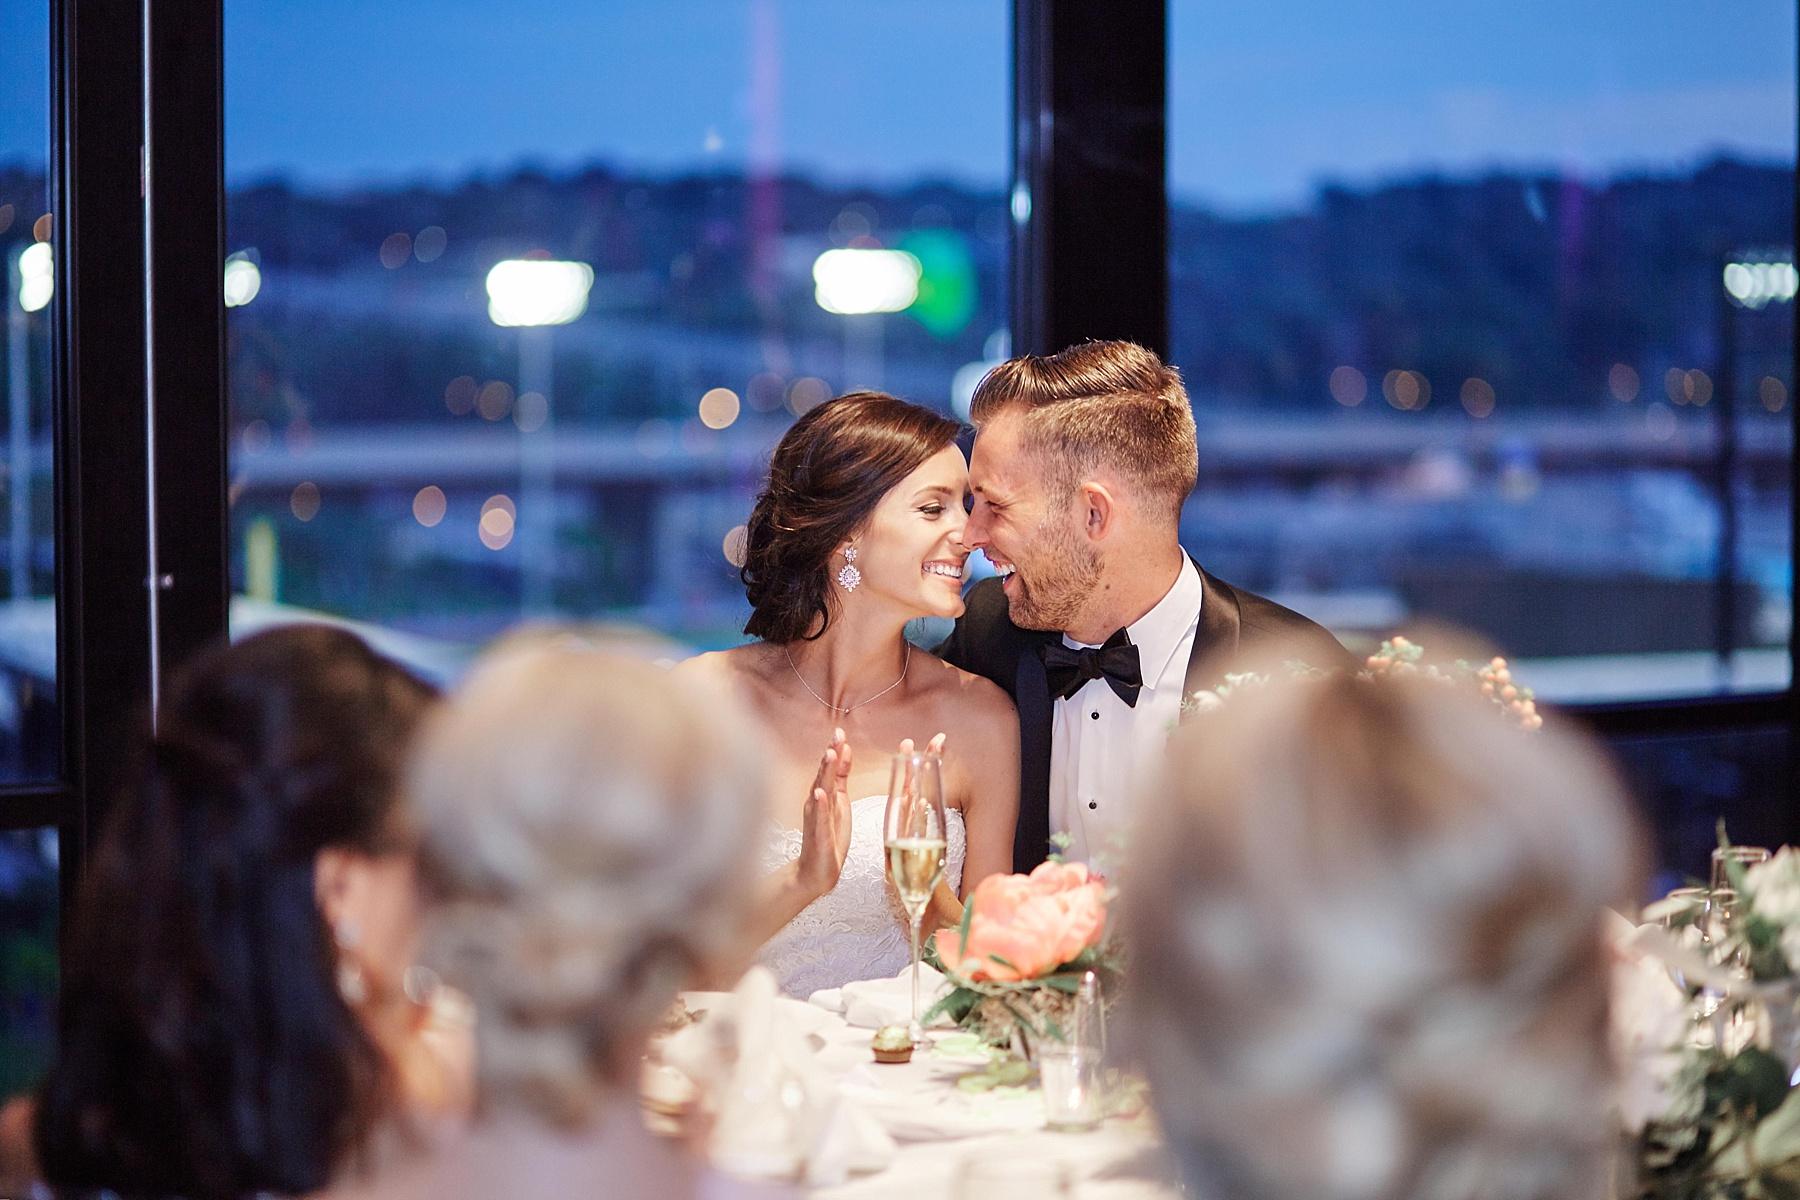 ABULAE-Wedding-Saint-paul-MN-Josh-Sofia-Wedding-Mears-Park_0841.jpg